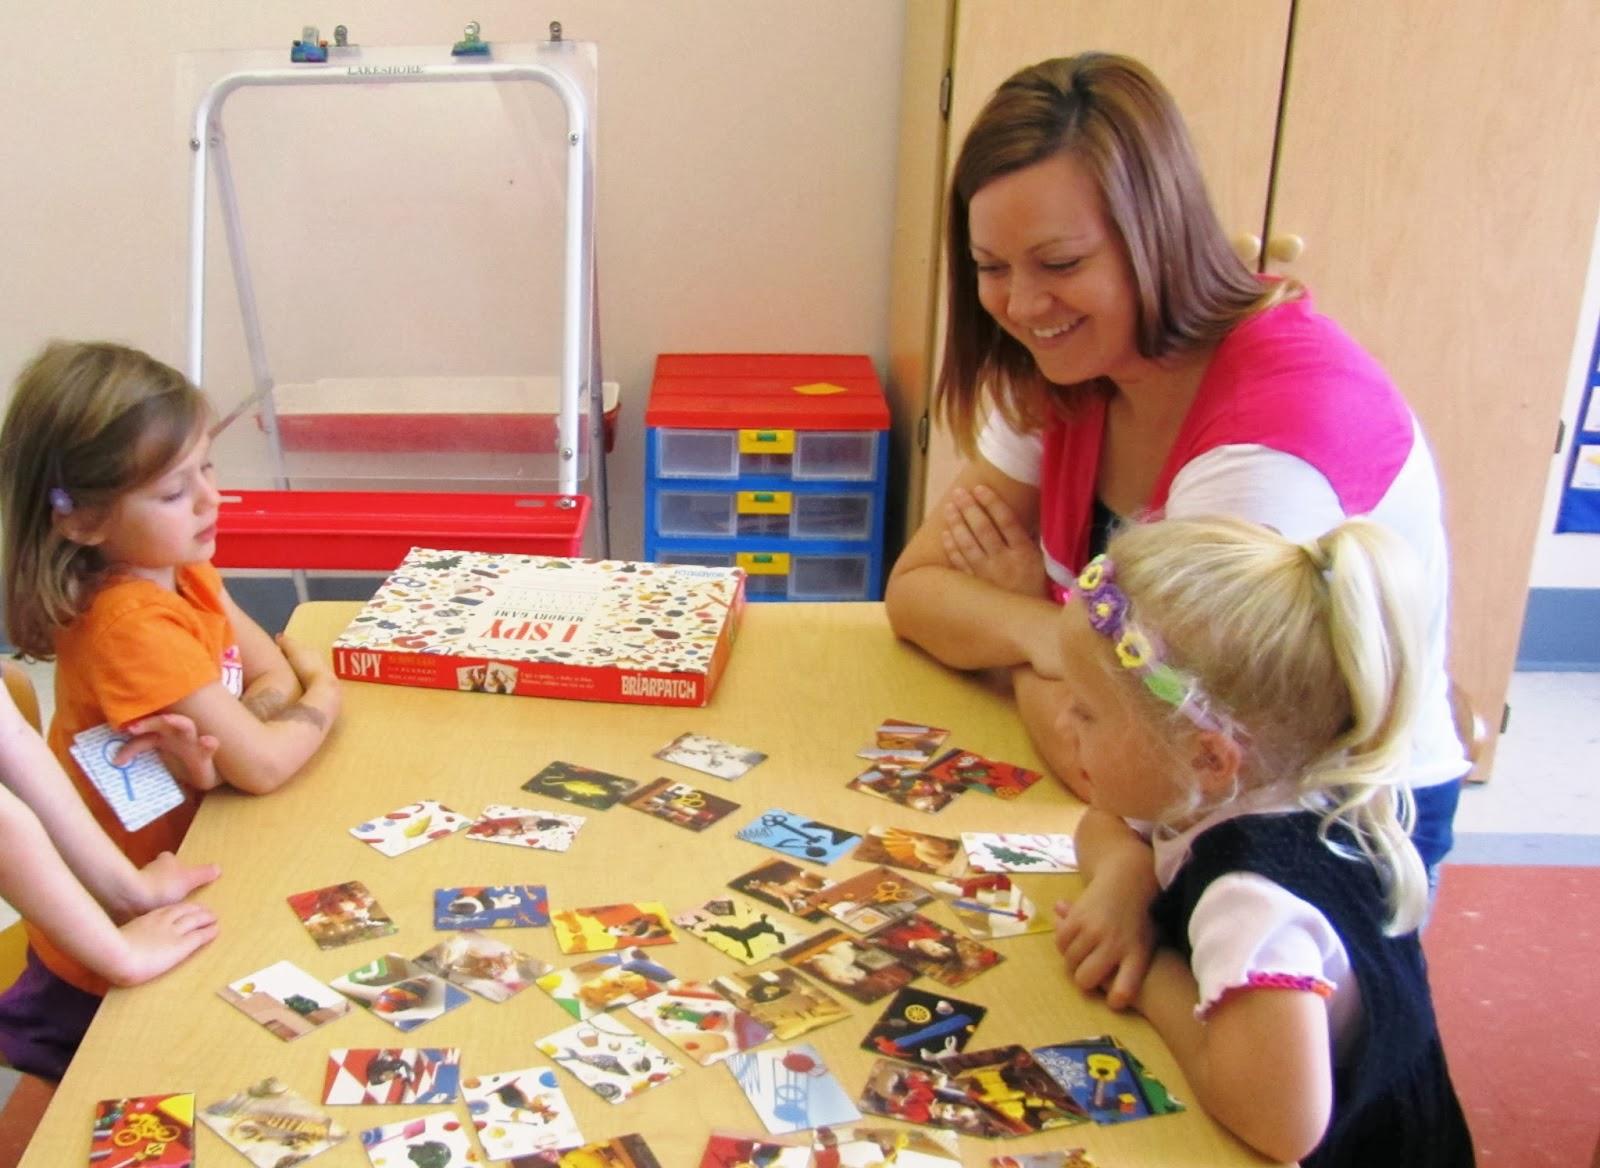 Child S Play Preschool Curriculum